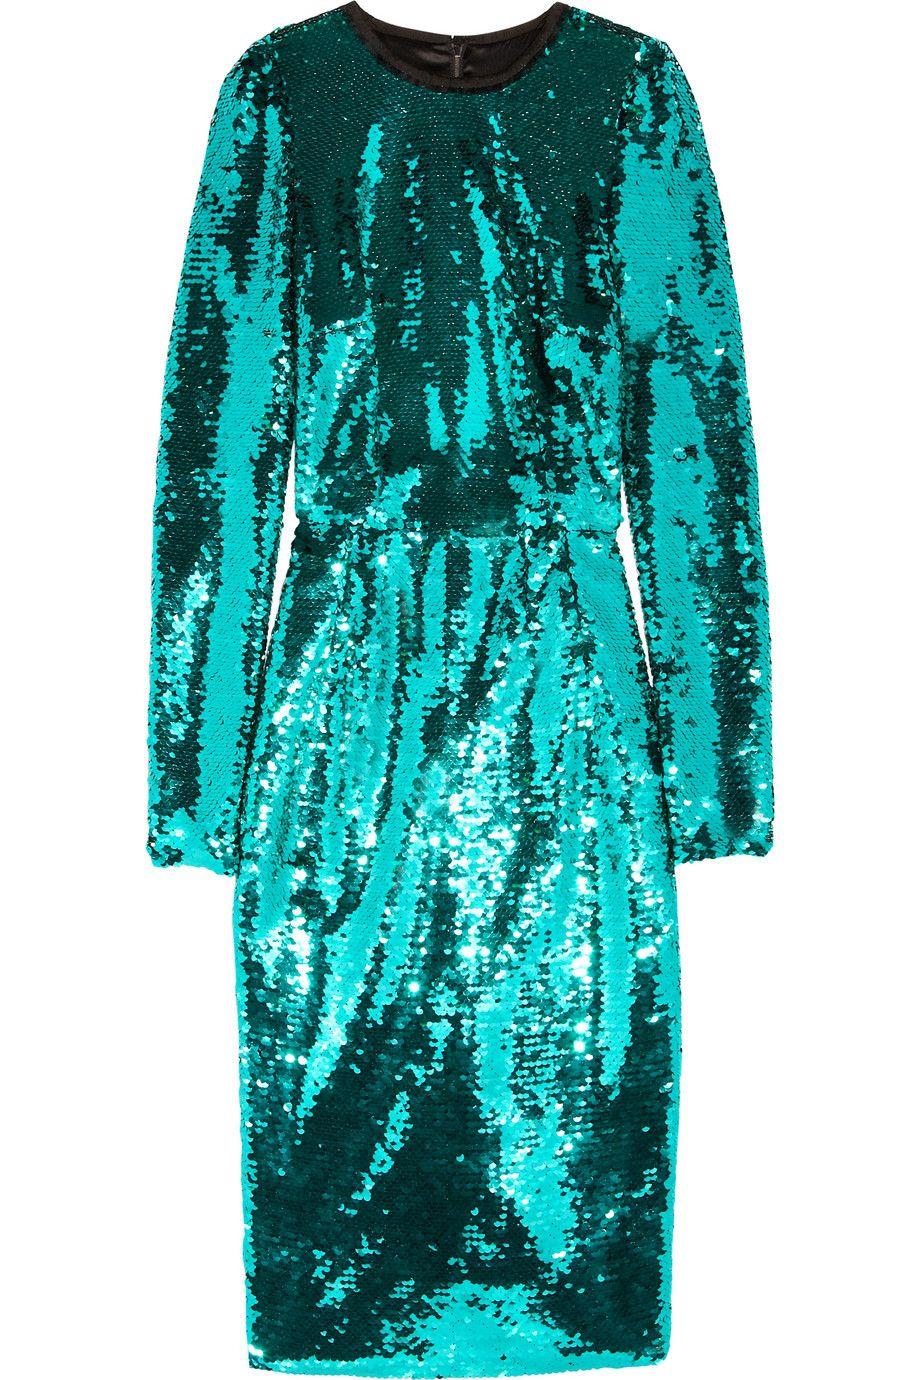 Dolce Gabbana Embellished Dress Metallic Cocktail Dresses Blue Long Sleeve Dress [ 1380 x 920 Pixel ]